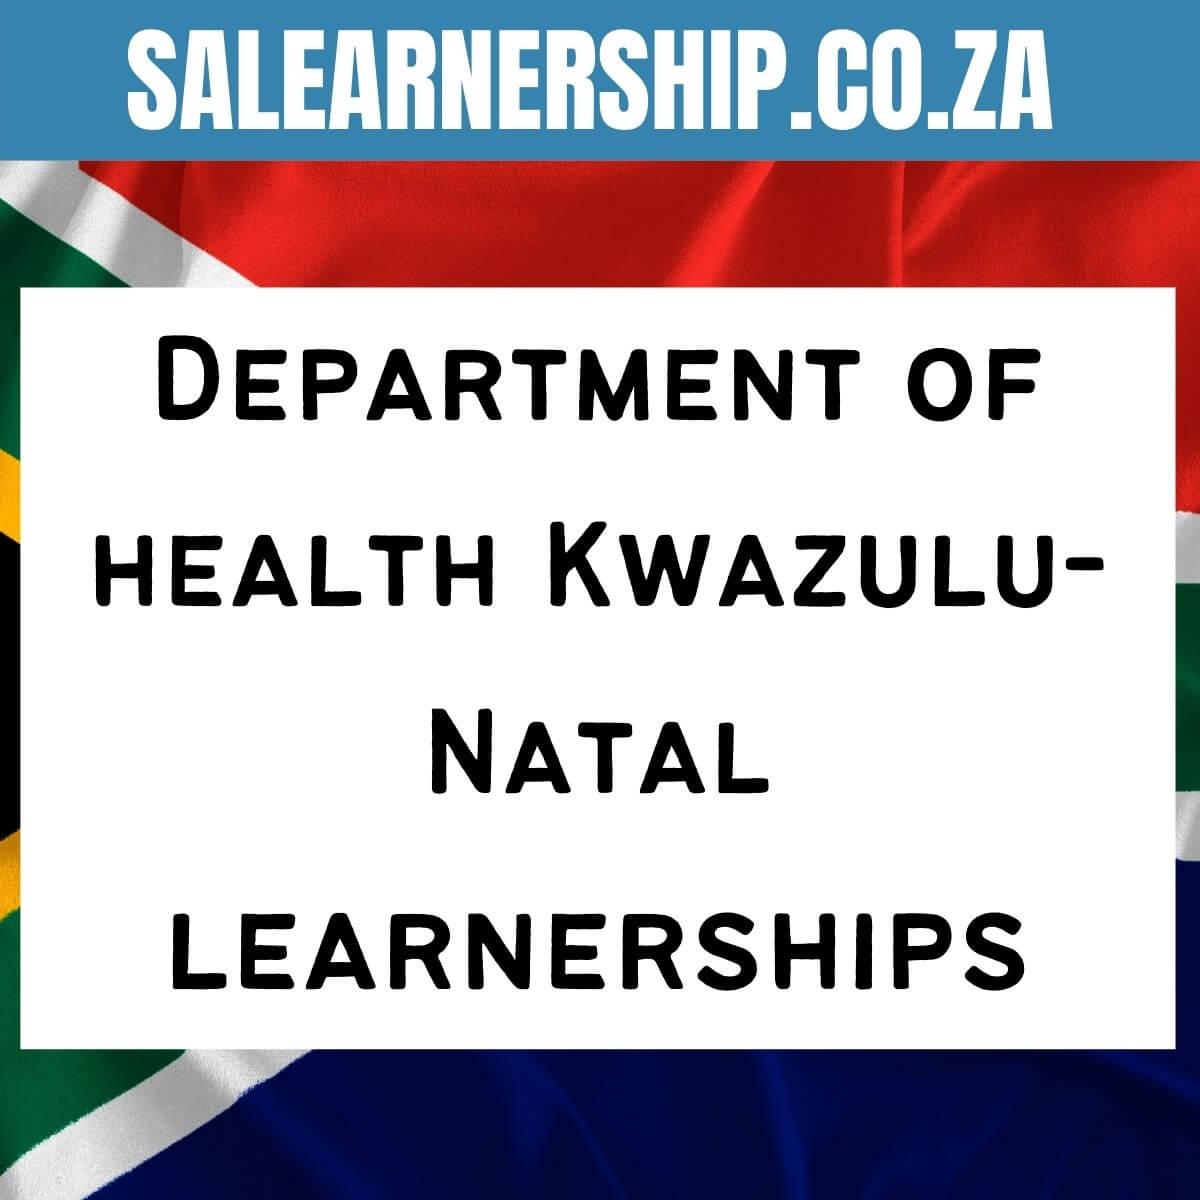 Department of health Kwazulu-Natal learnerships